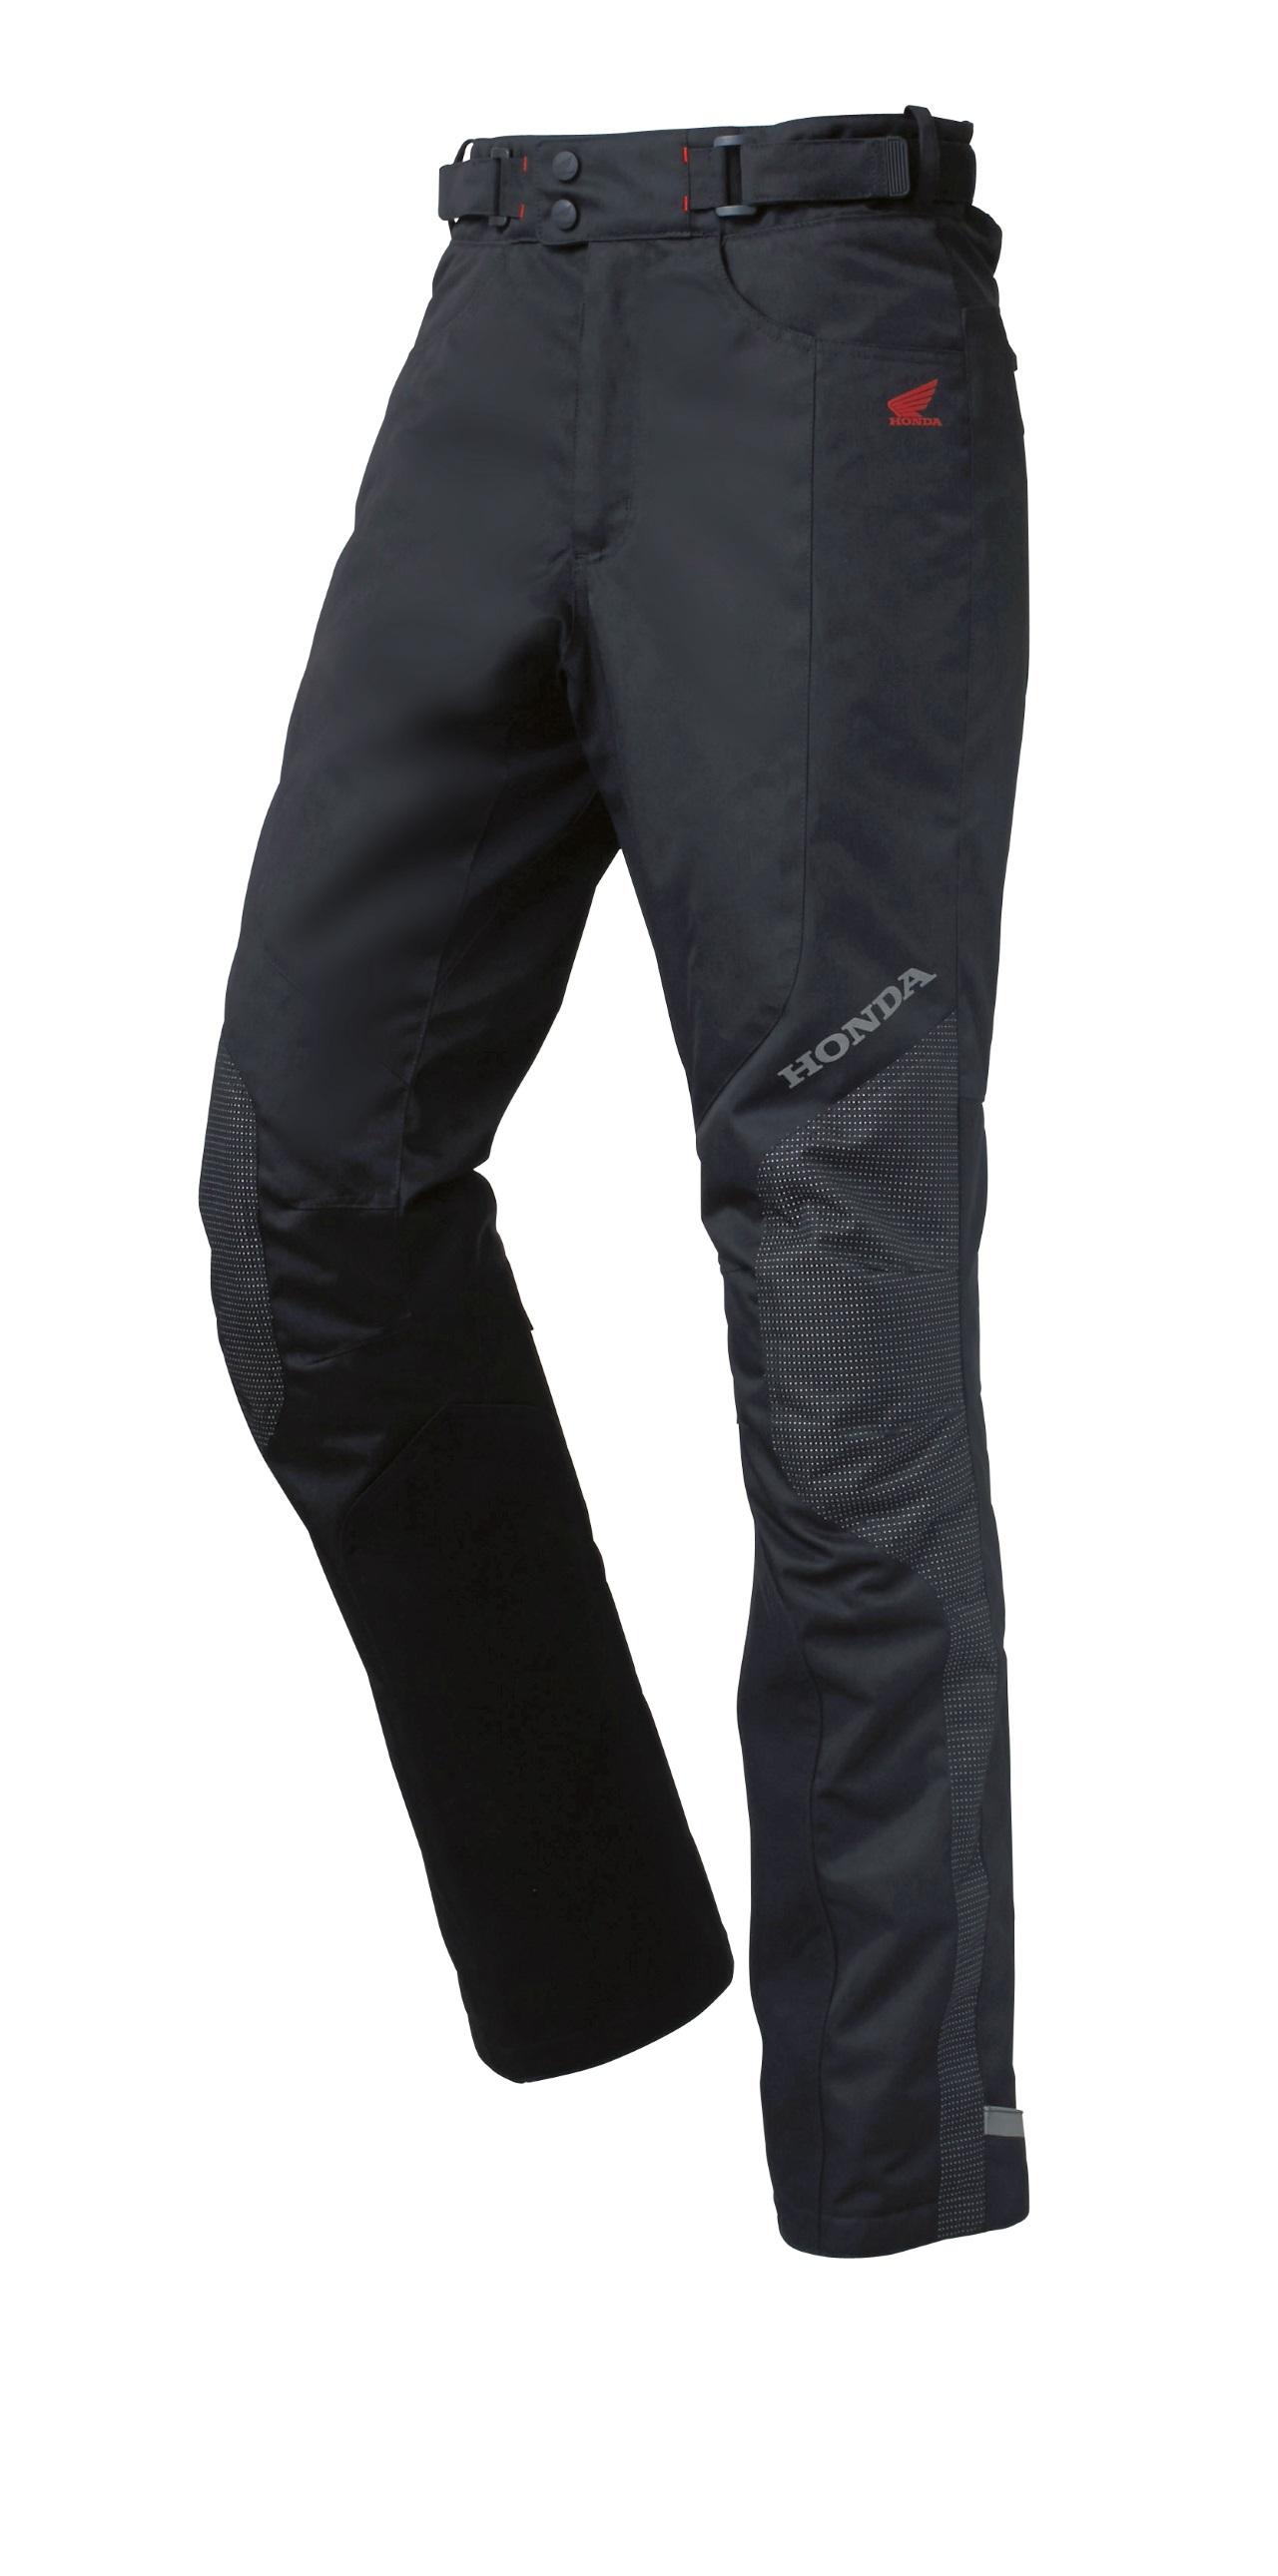 Slim Fit Protect Winter Pants